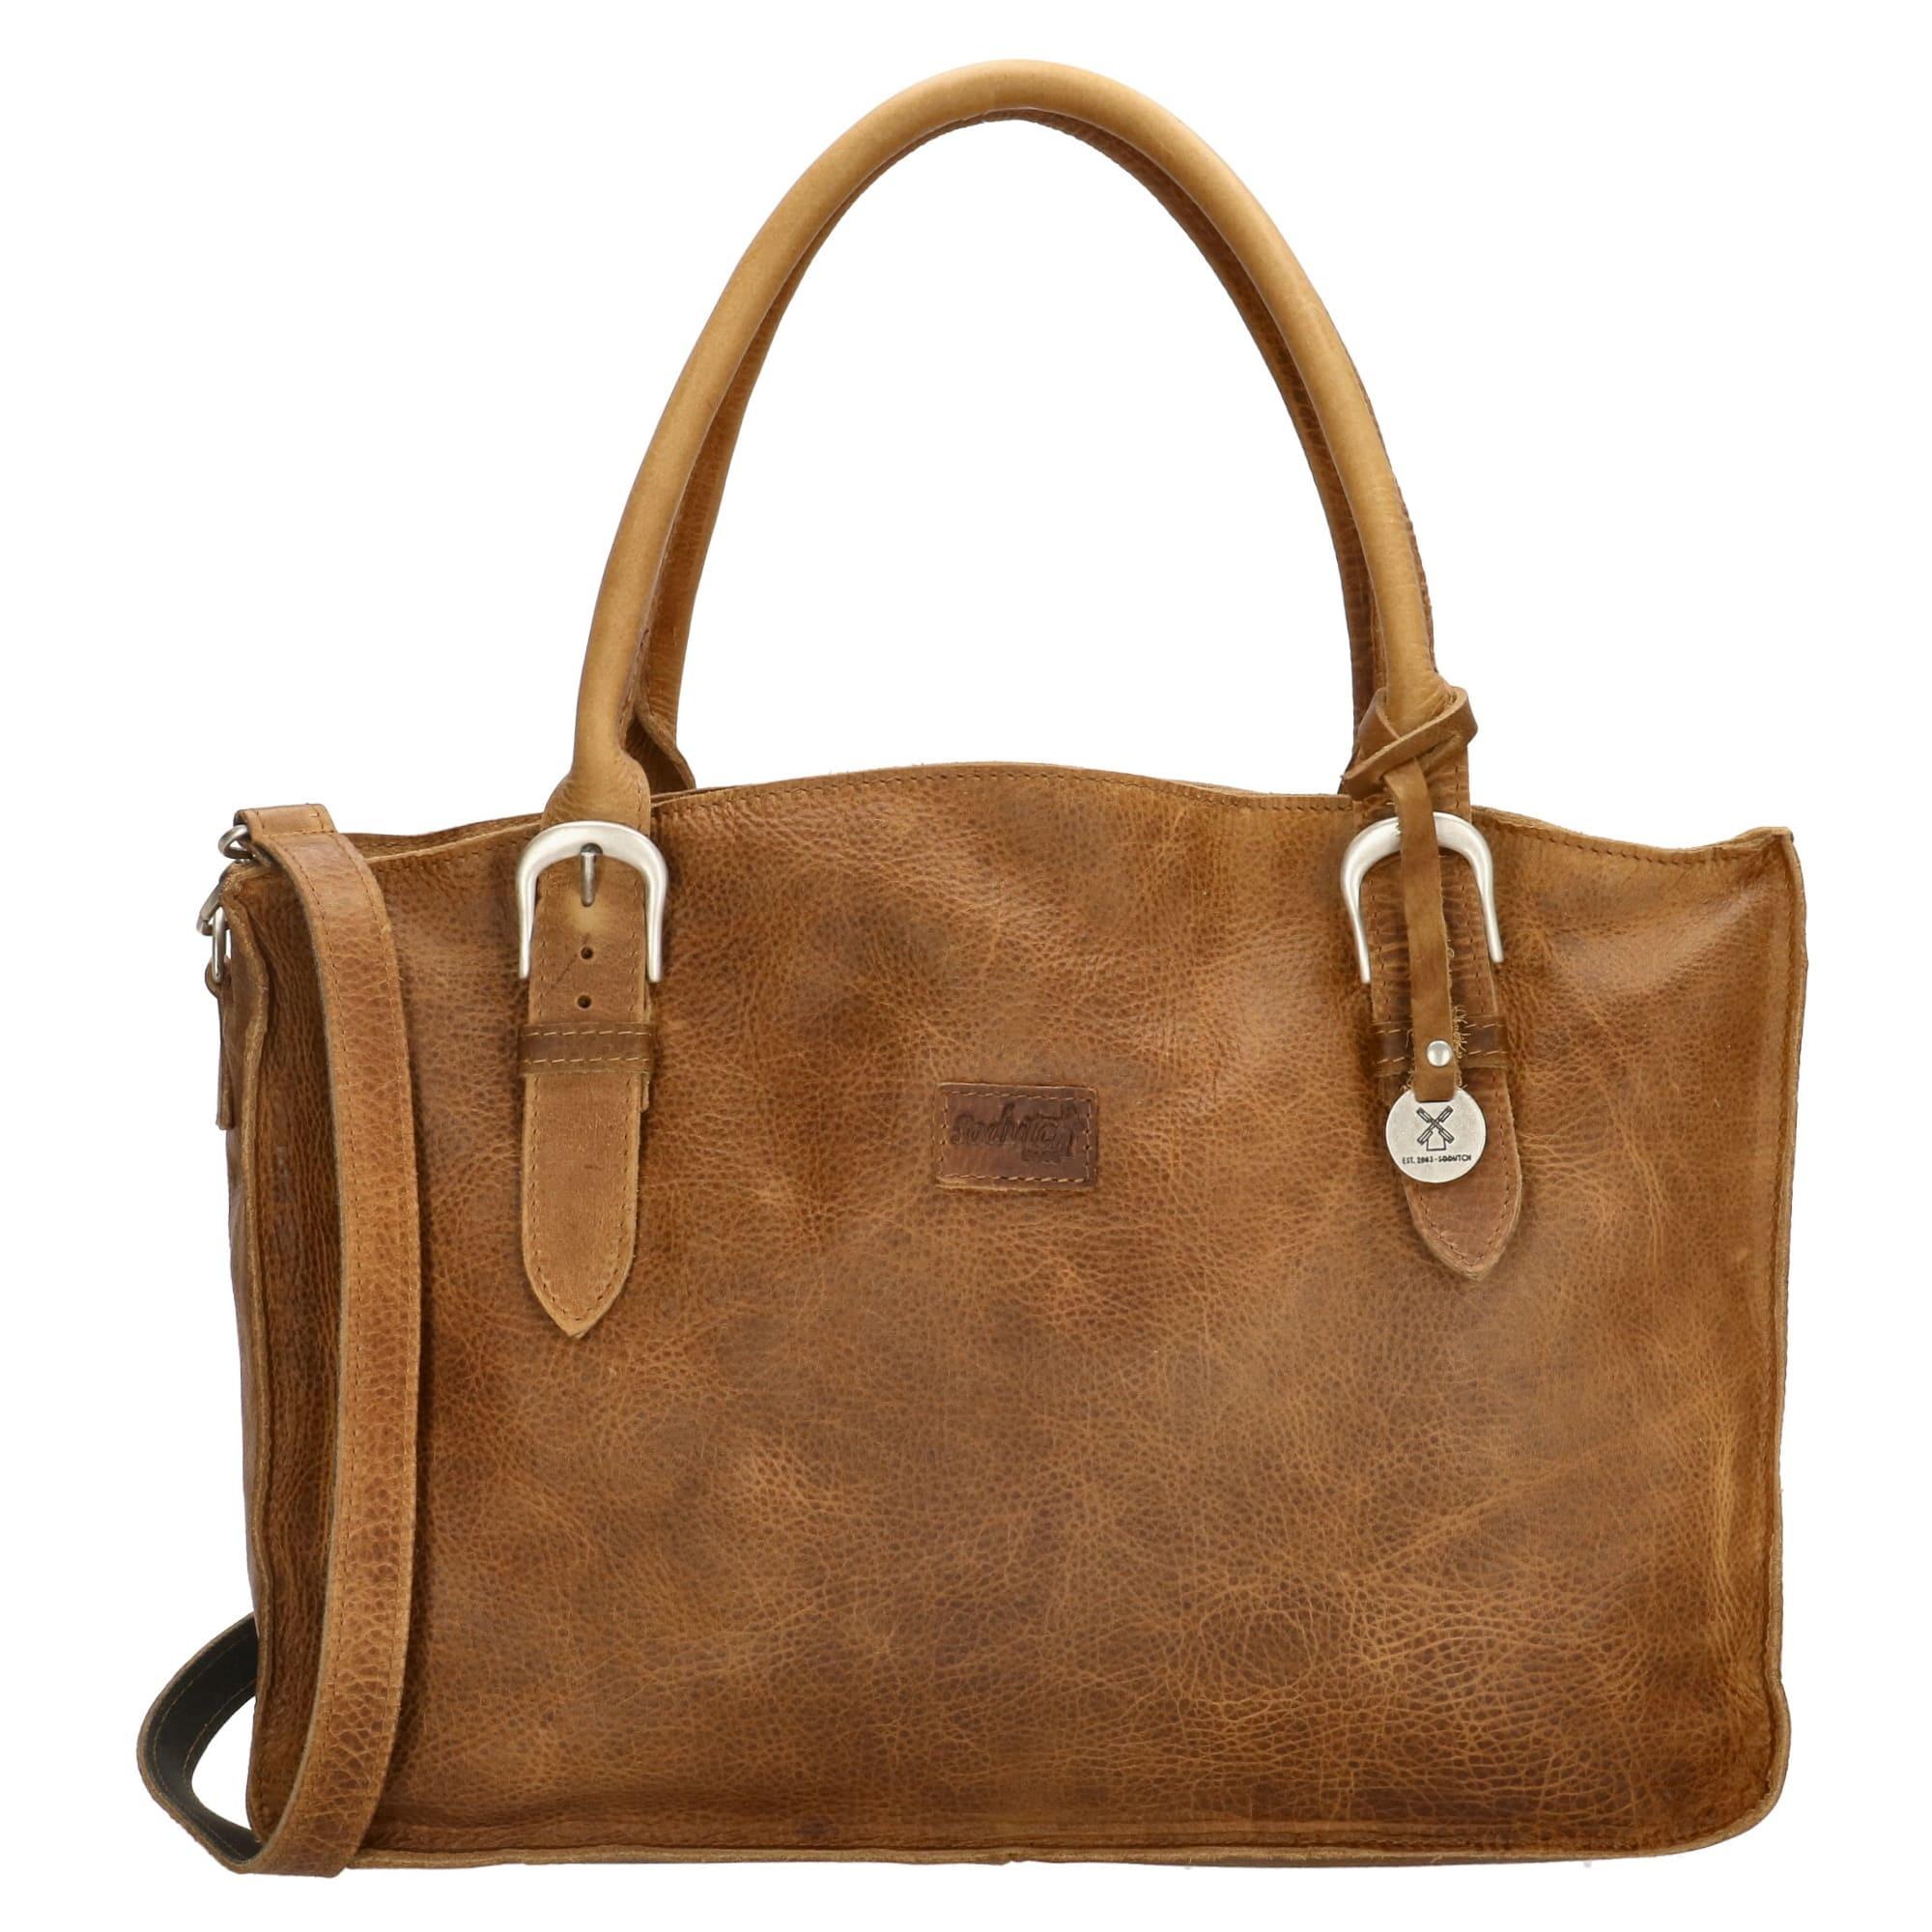 SoDutch Bags Laptoptas #09 Cognac